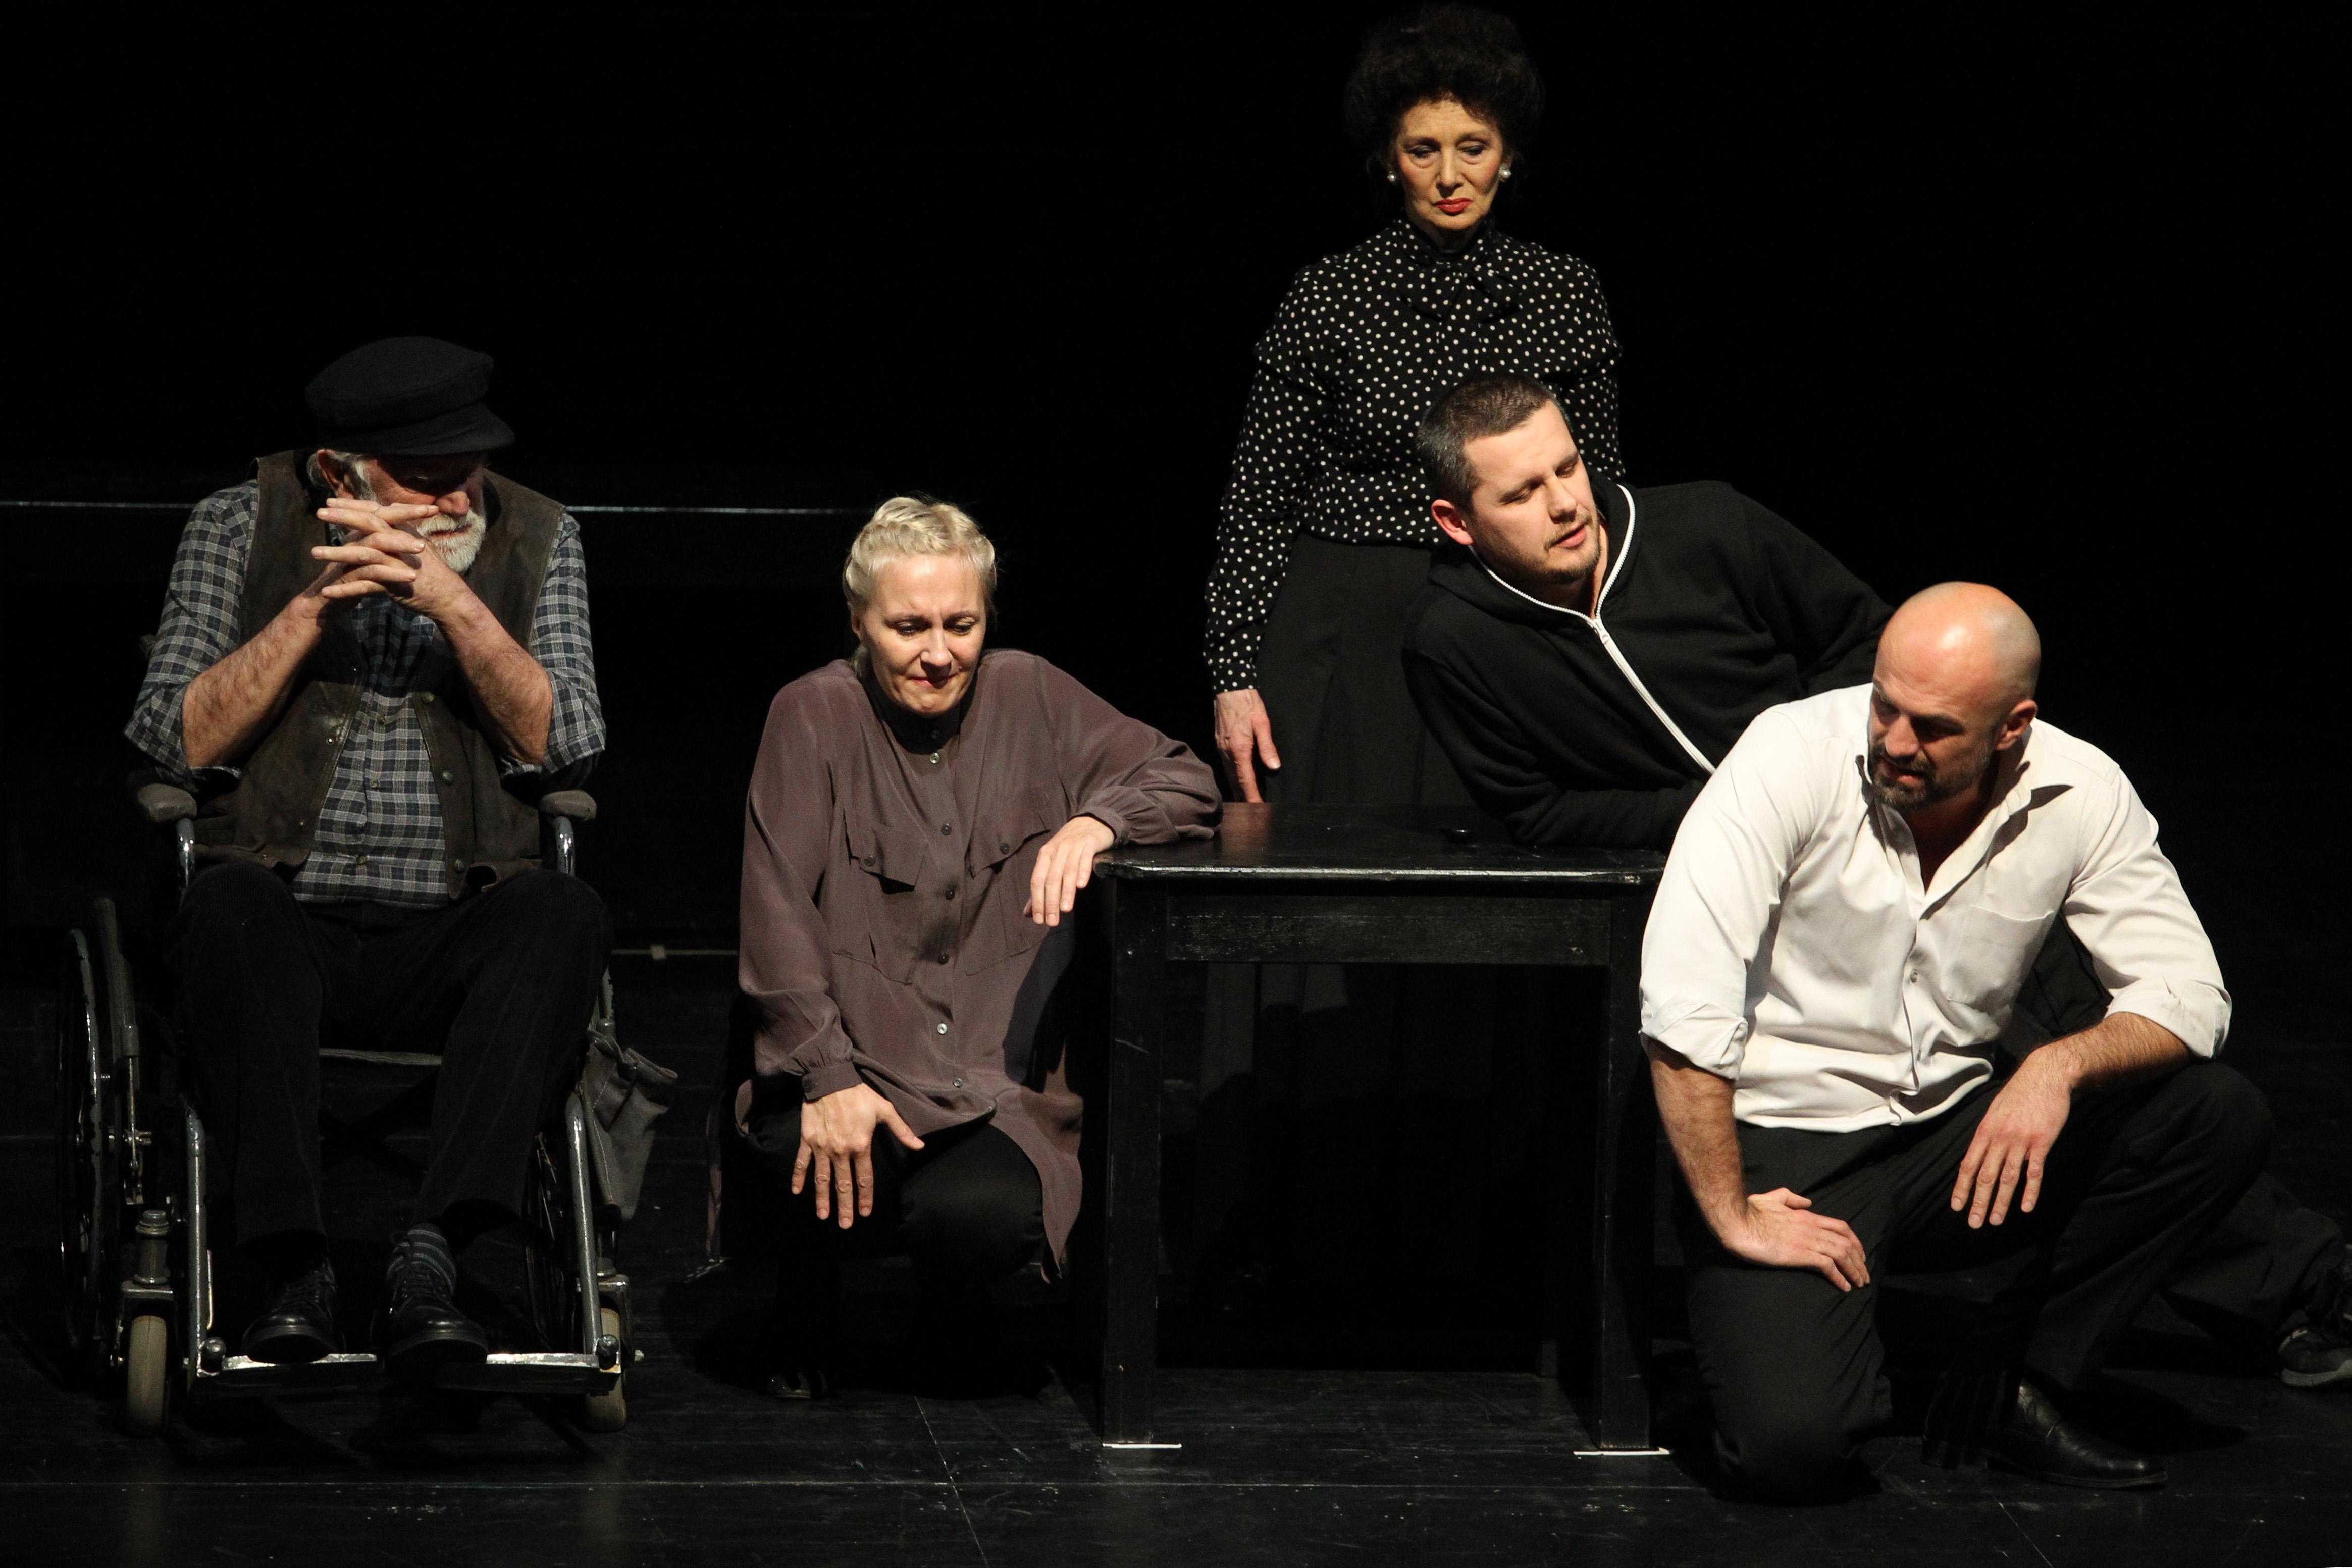 RCC supported guest performance of 'Divlje meso' by Sarajevo National Theatre in Belgrade, 21 December 2017. (Photo: RCC/Milan Obradovic)